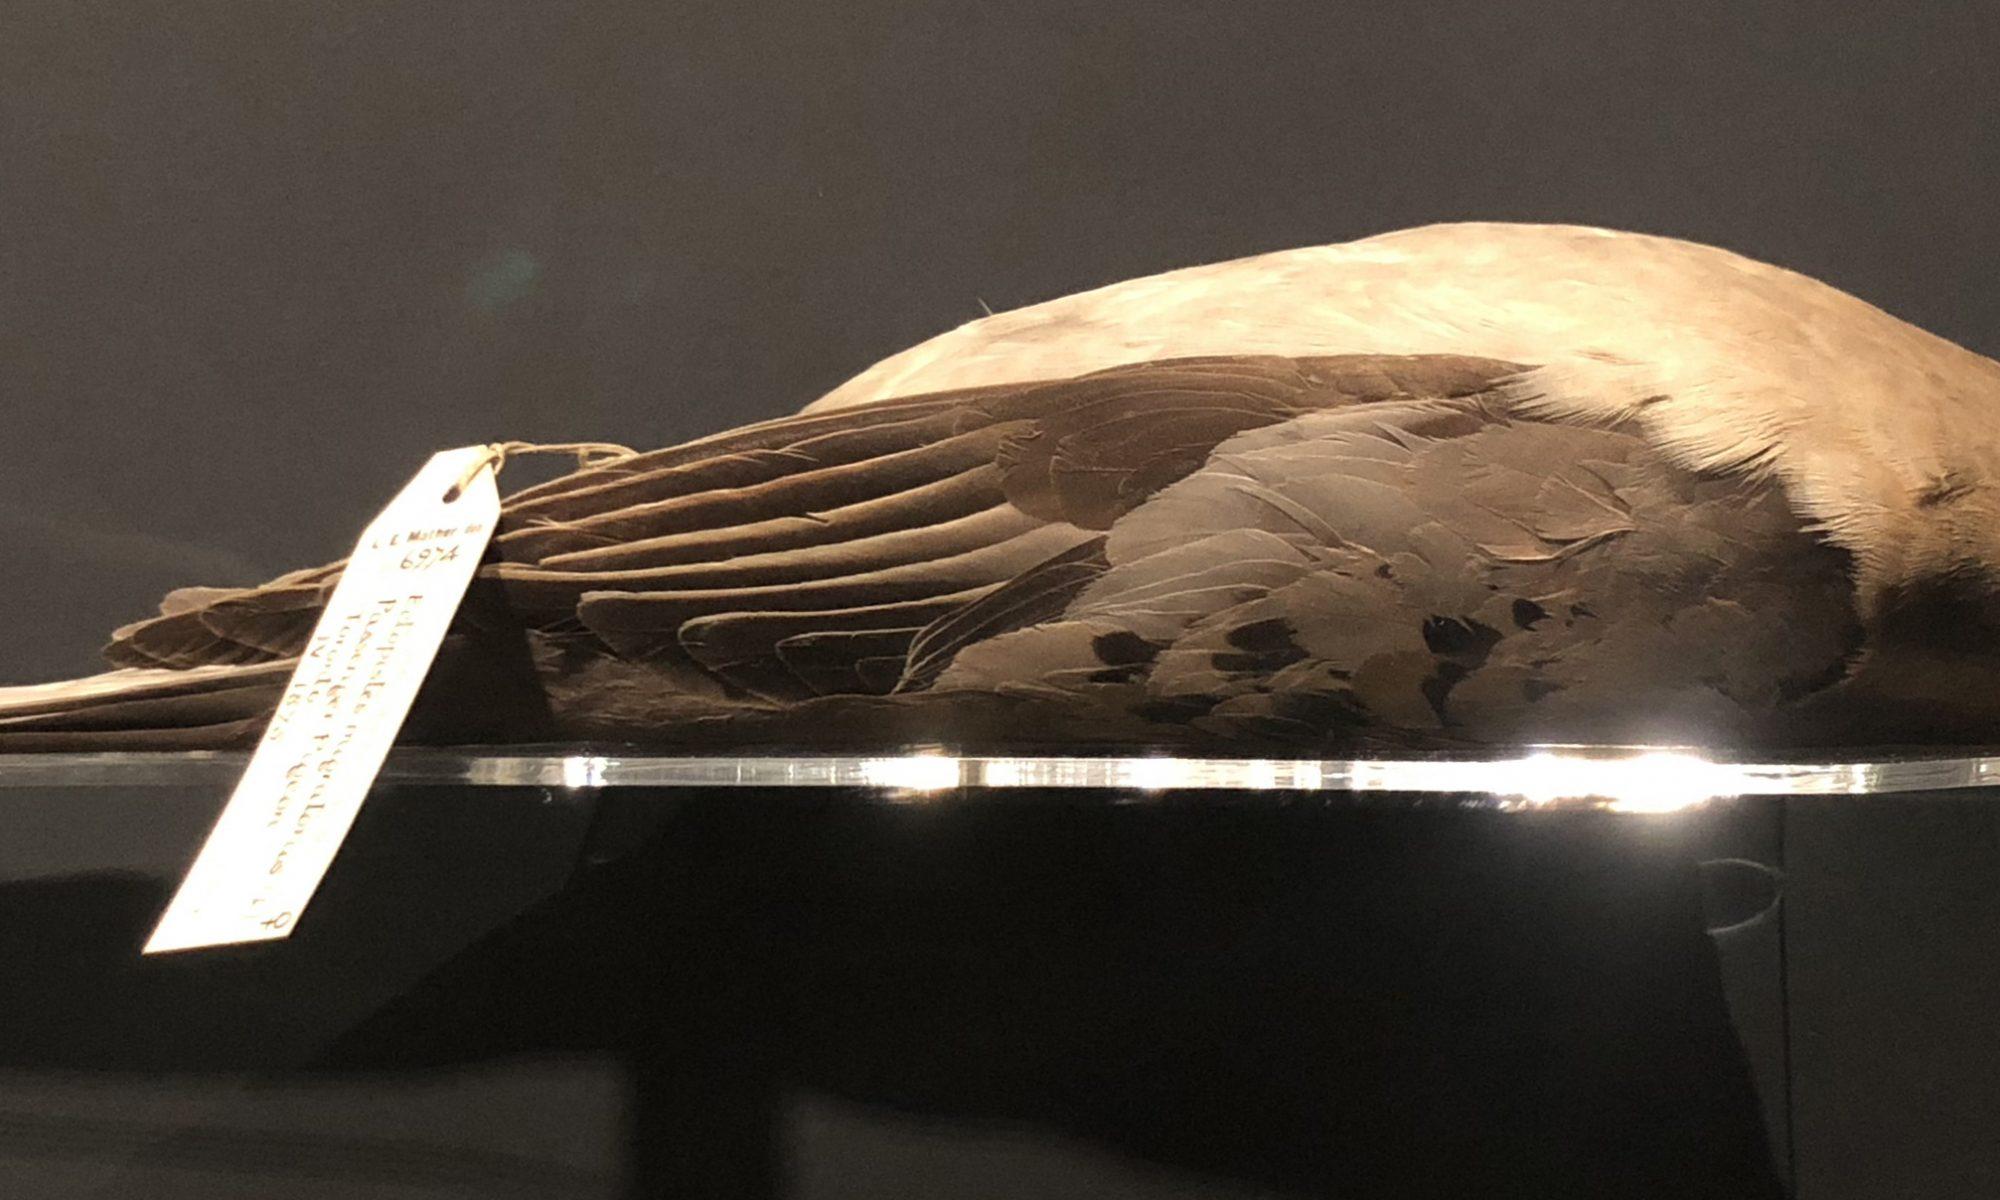 passenger pigeon specimen in Manchester Museum